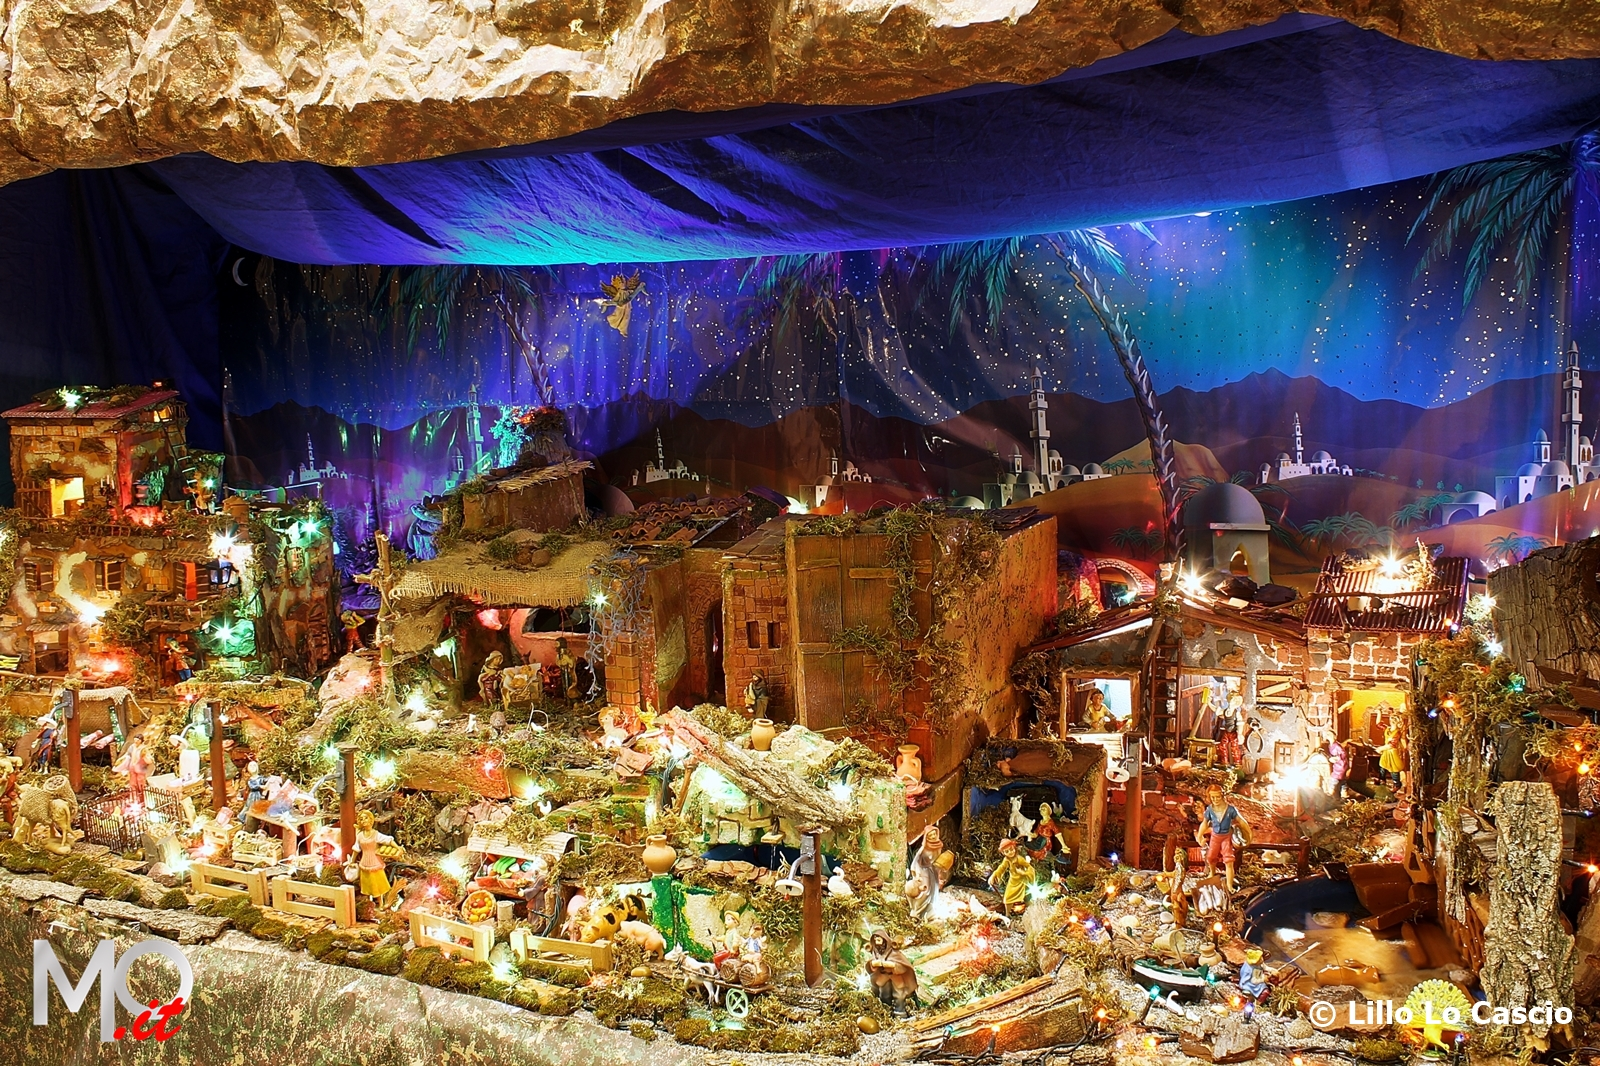 Natale 2015 fino al 10 gennaio al santuario di s antonio - Presepe in casa ...